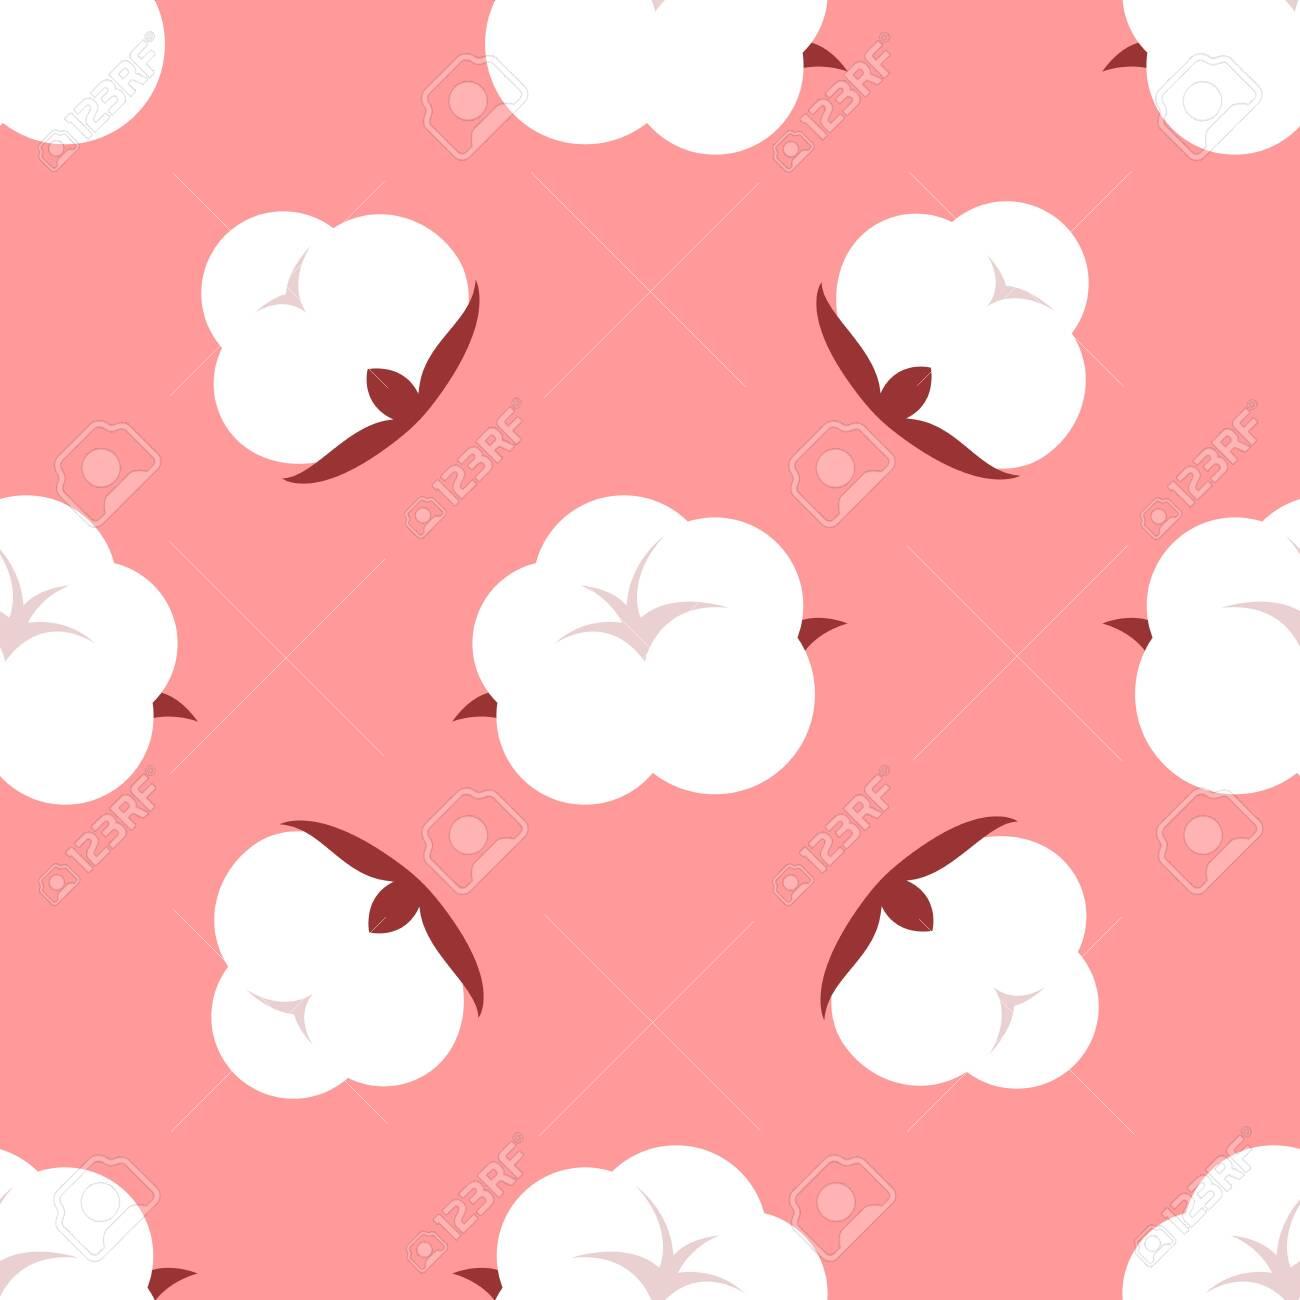 Cute cartoon pattern. Seamless vector illustration with cotton flower - 144797512